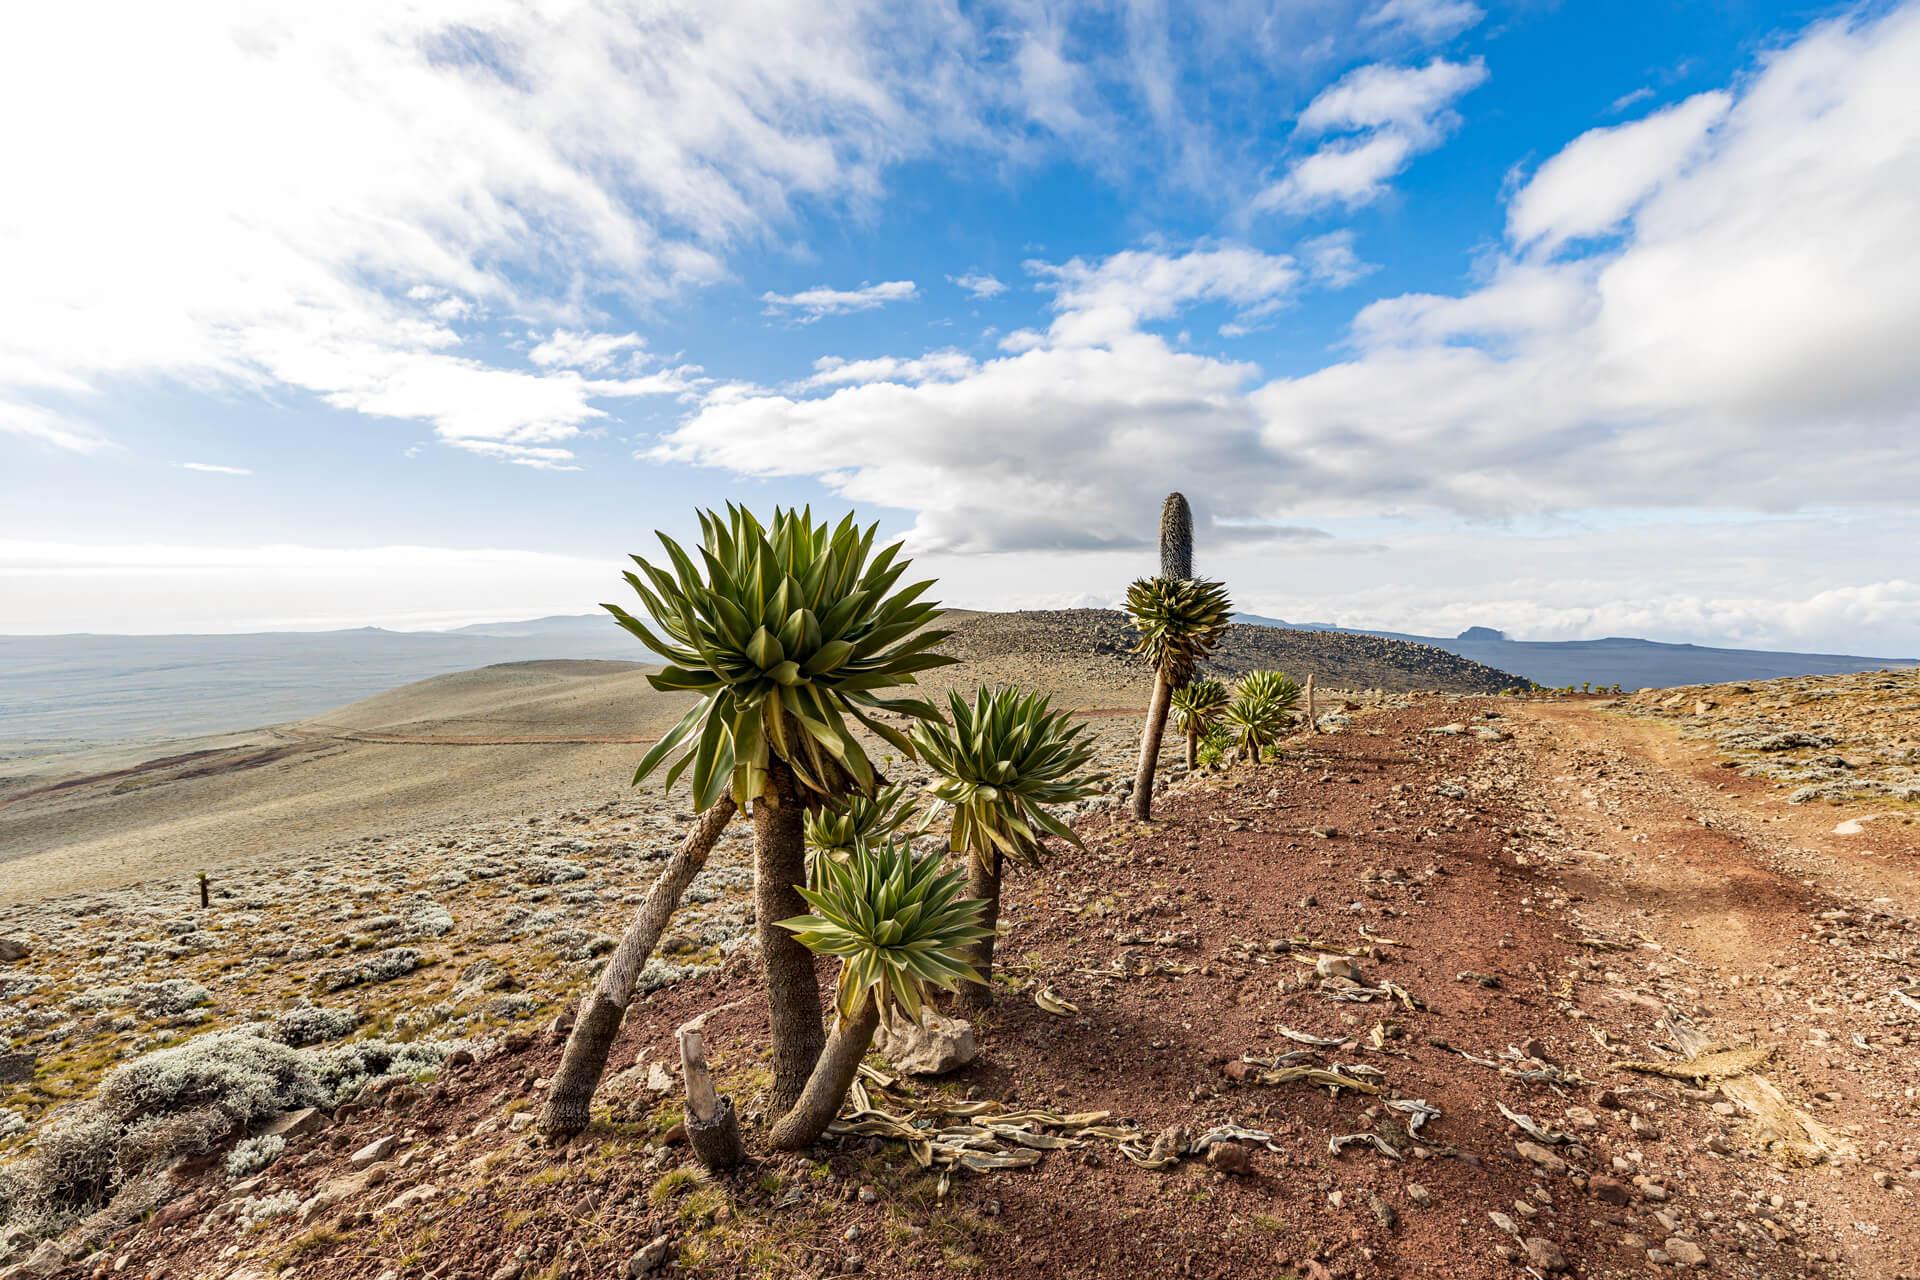 Ethiopia-travel-tour-adventure-Bale-mountains-landscape-sanetti plateu-Tulu Dimtu